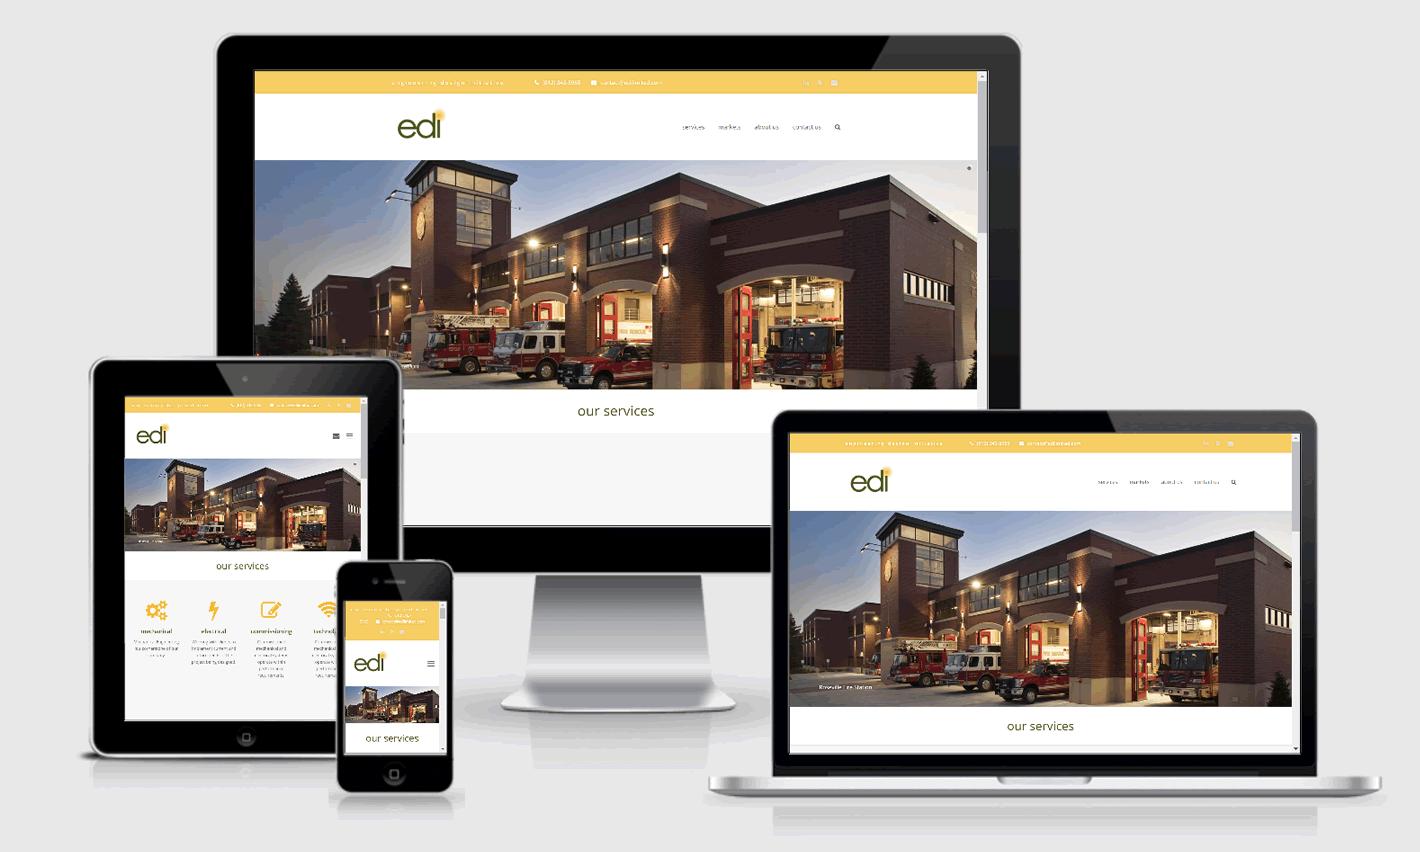 Edi Limited Responsive Website Design